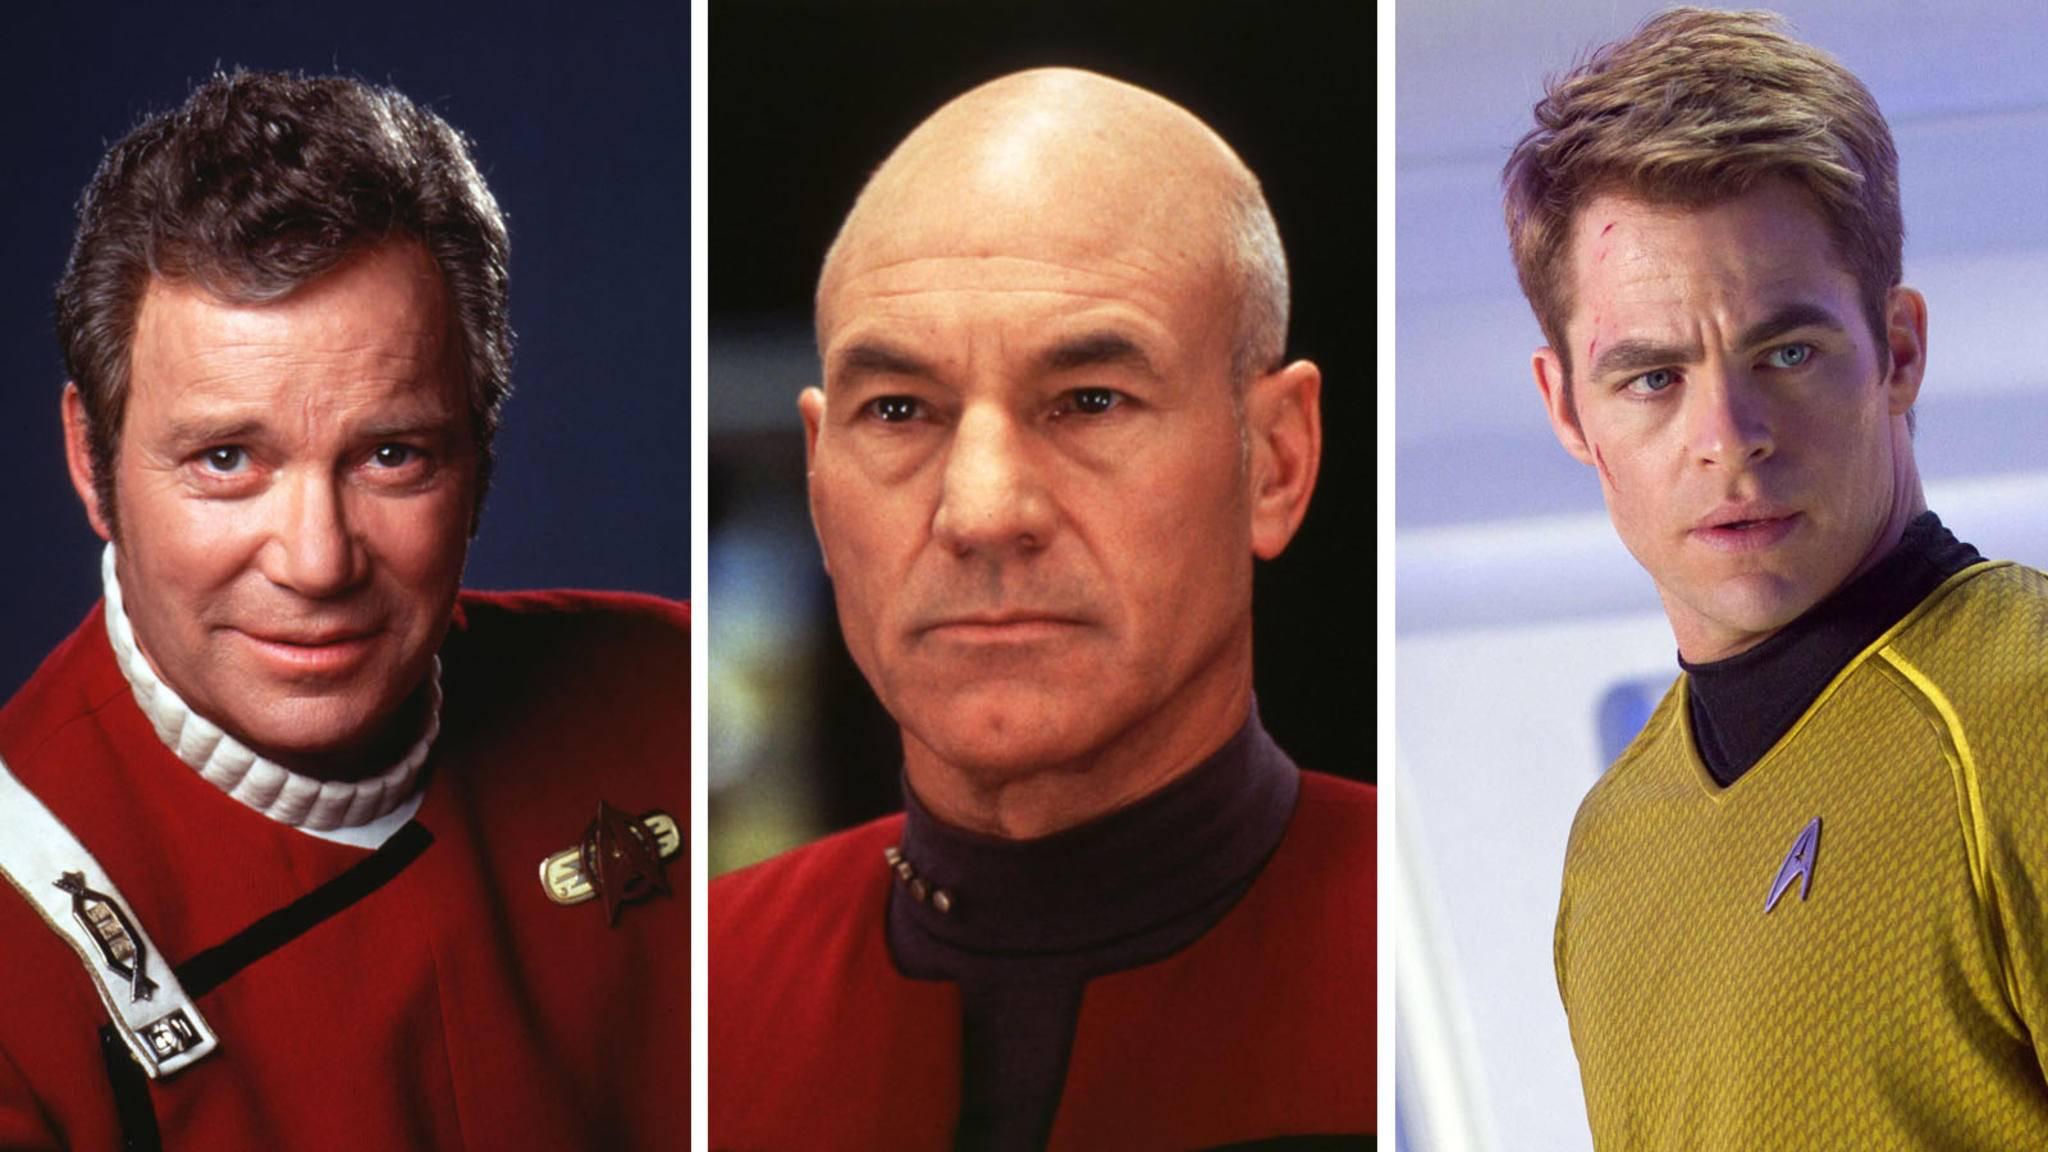 Star trek-William Shatner-picture alliance-United Archives-85934020-Star Trek-Jean-Luc Picard-picture alliance-United Archives-85933950-Star Trek-James T. Kirk-picture alliance-Everett Collection